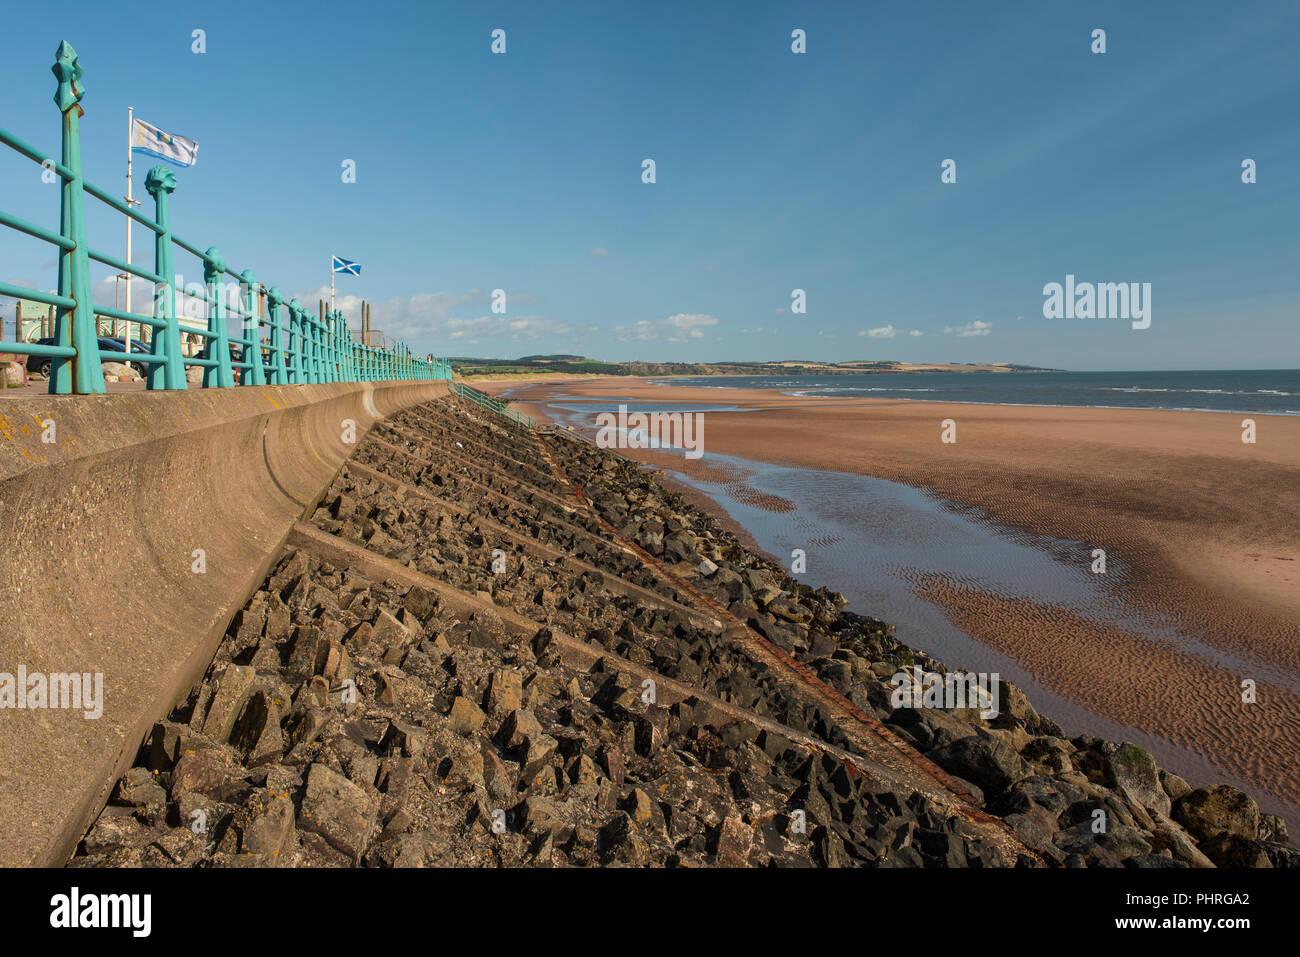 Rock armour at Montrose beach front Splash area, Montrose, Angus, Scotland. Stock Photo